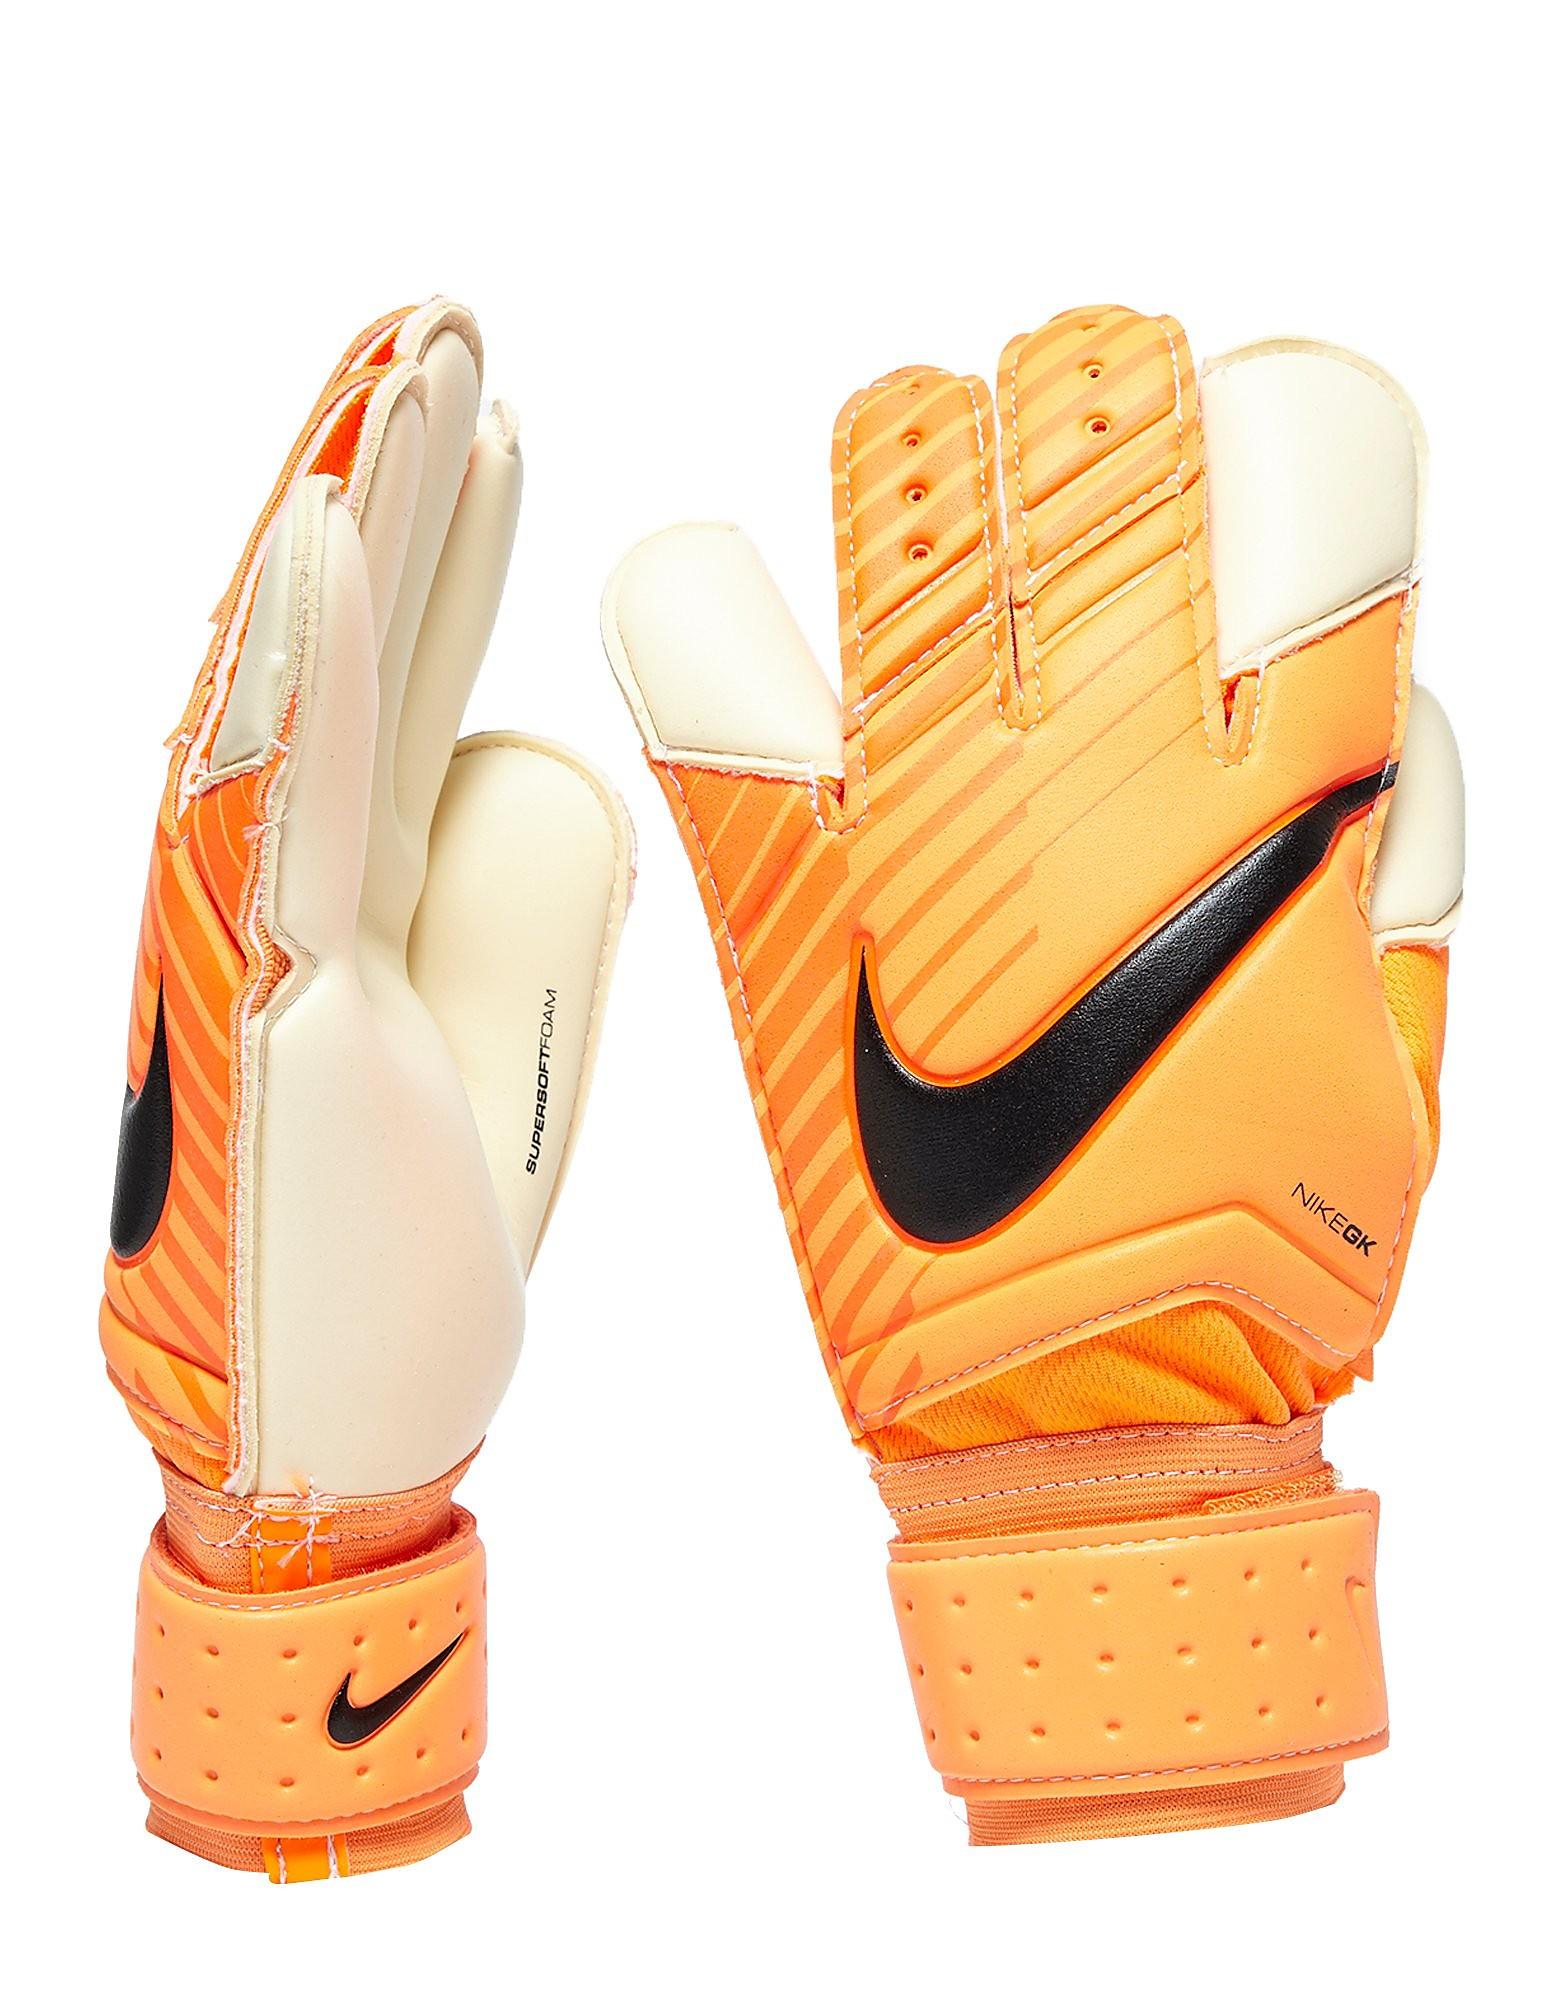 Nike Gants gardien de but Grip 3 Homme